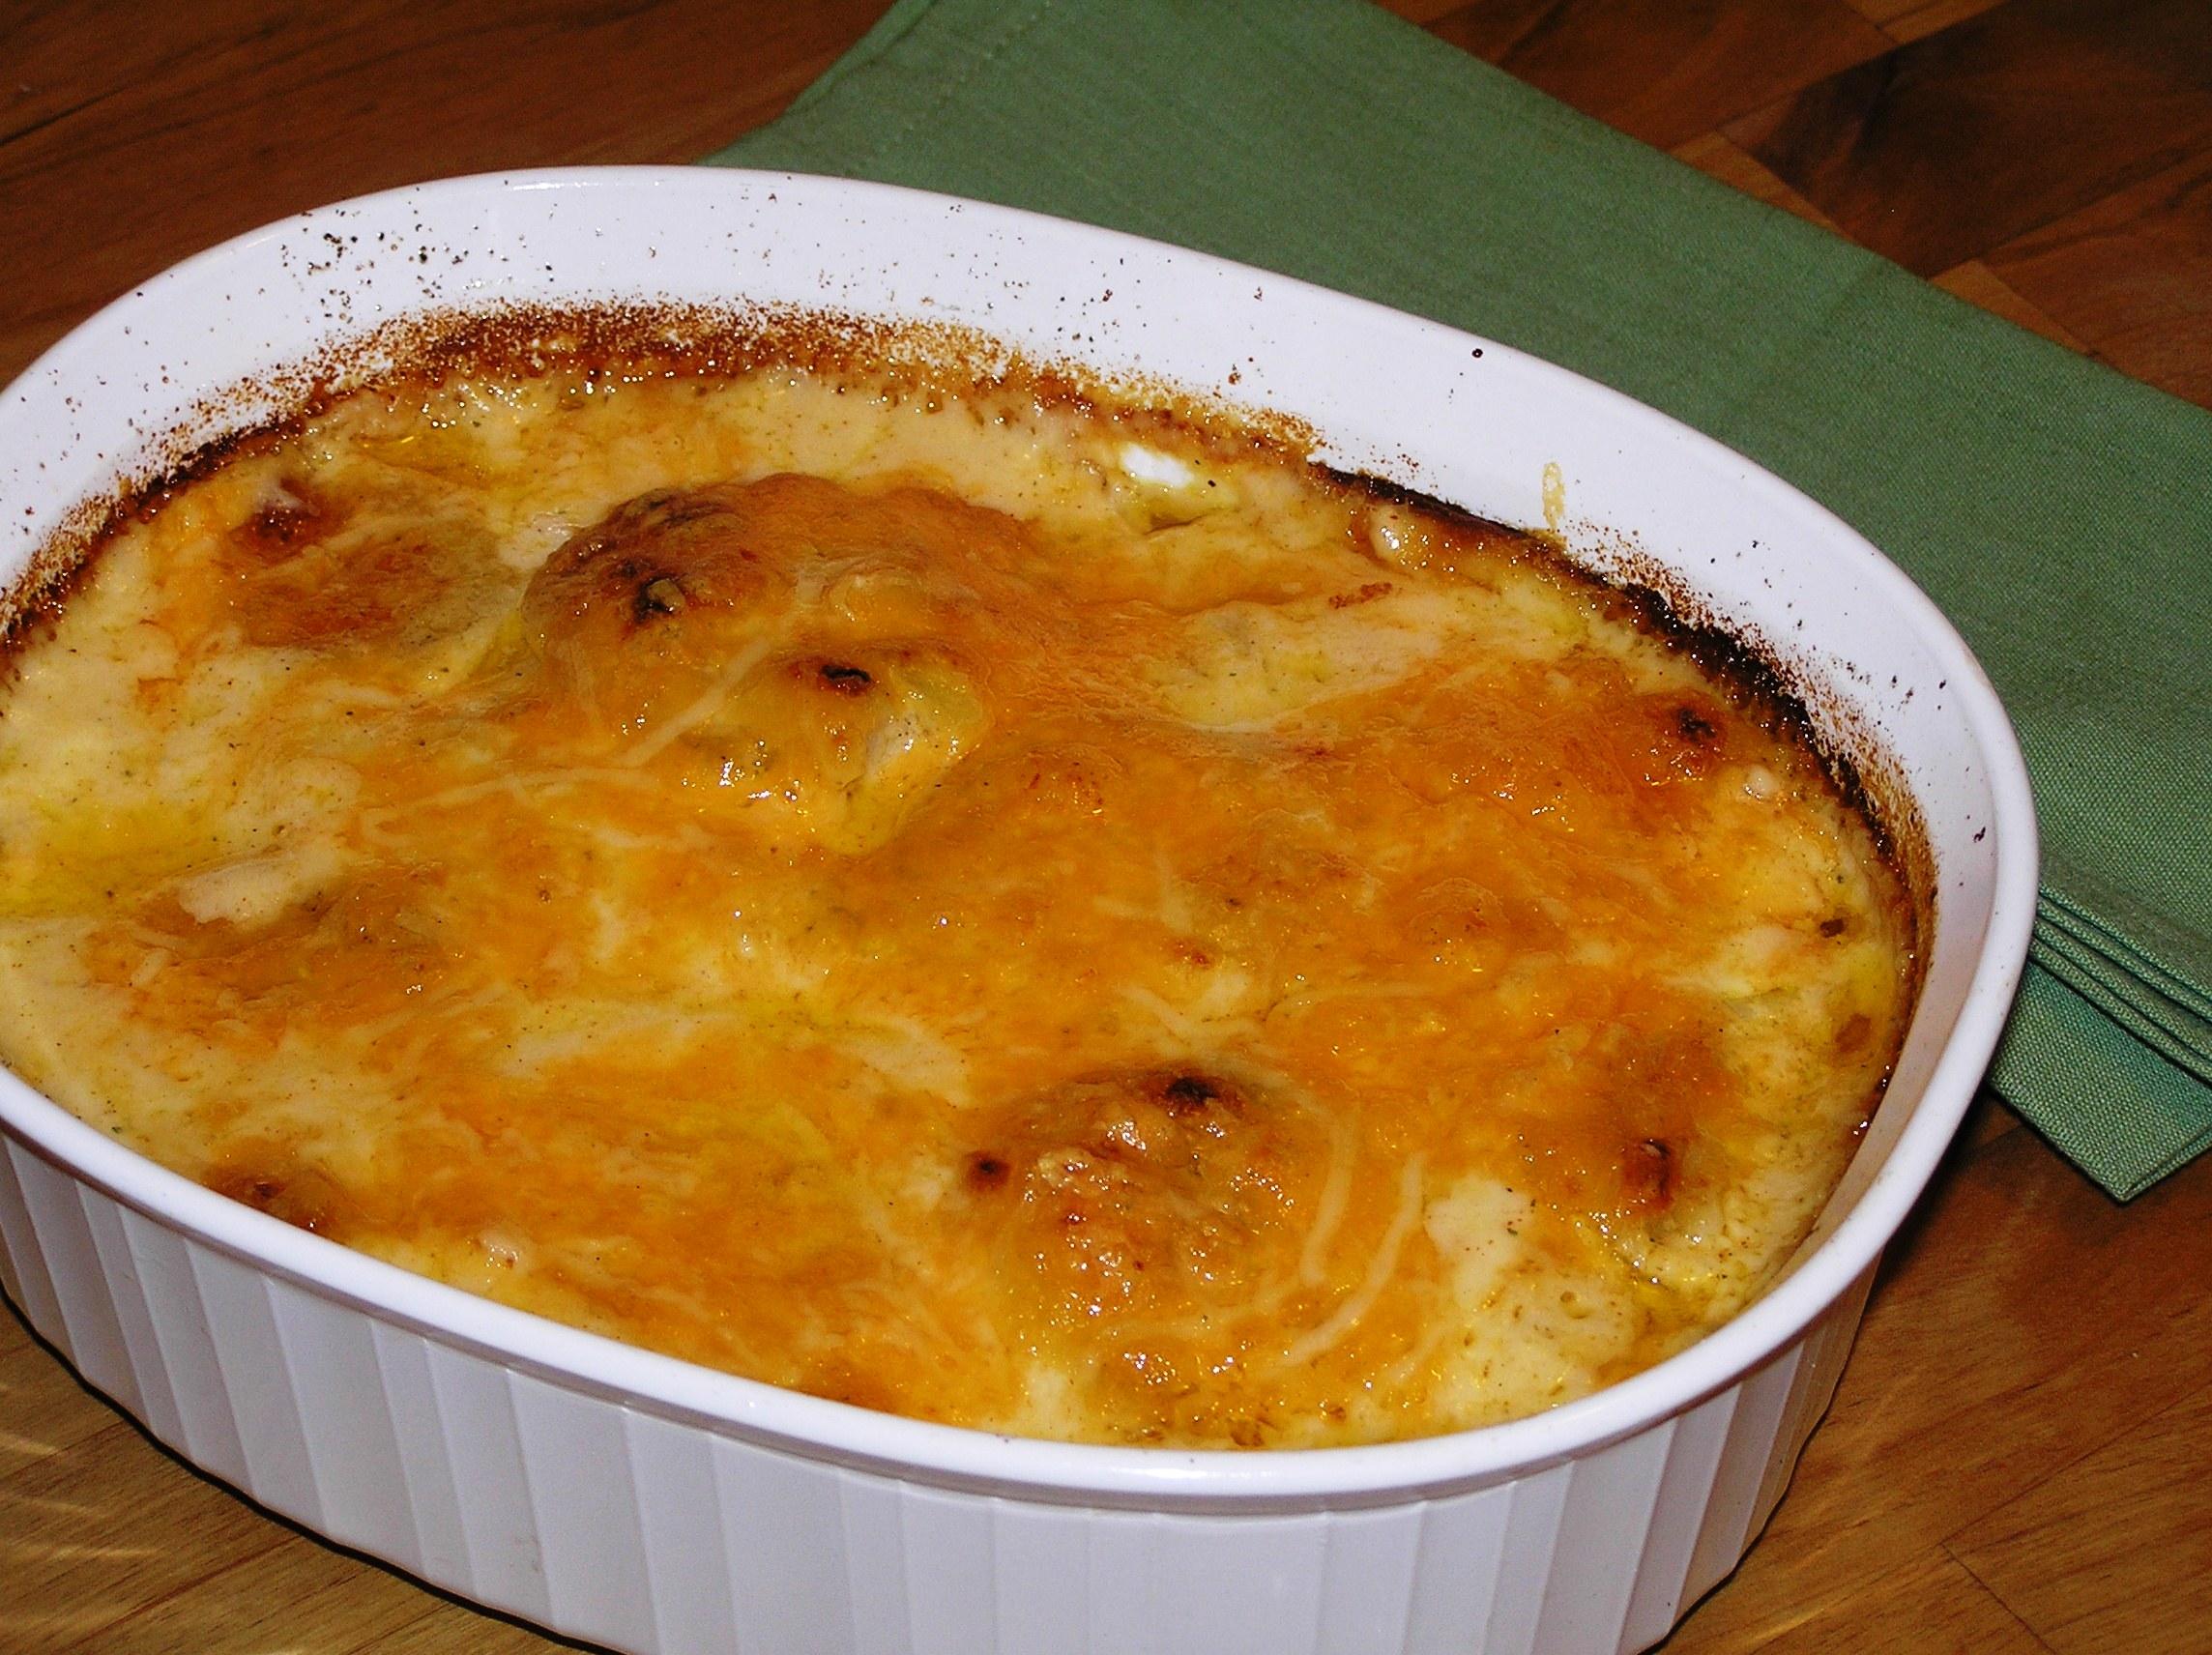 Ooey Gooey Au Gratin Potatoes Anotherfoodieblogger